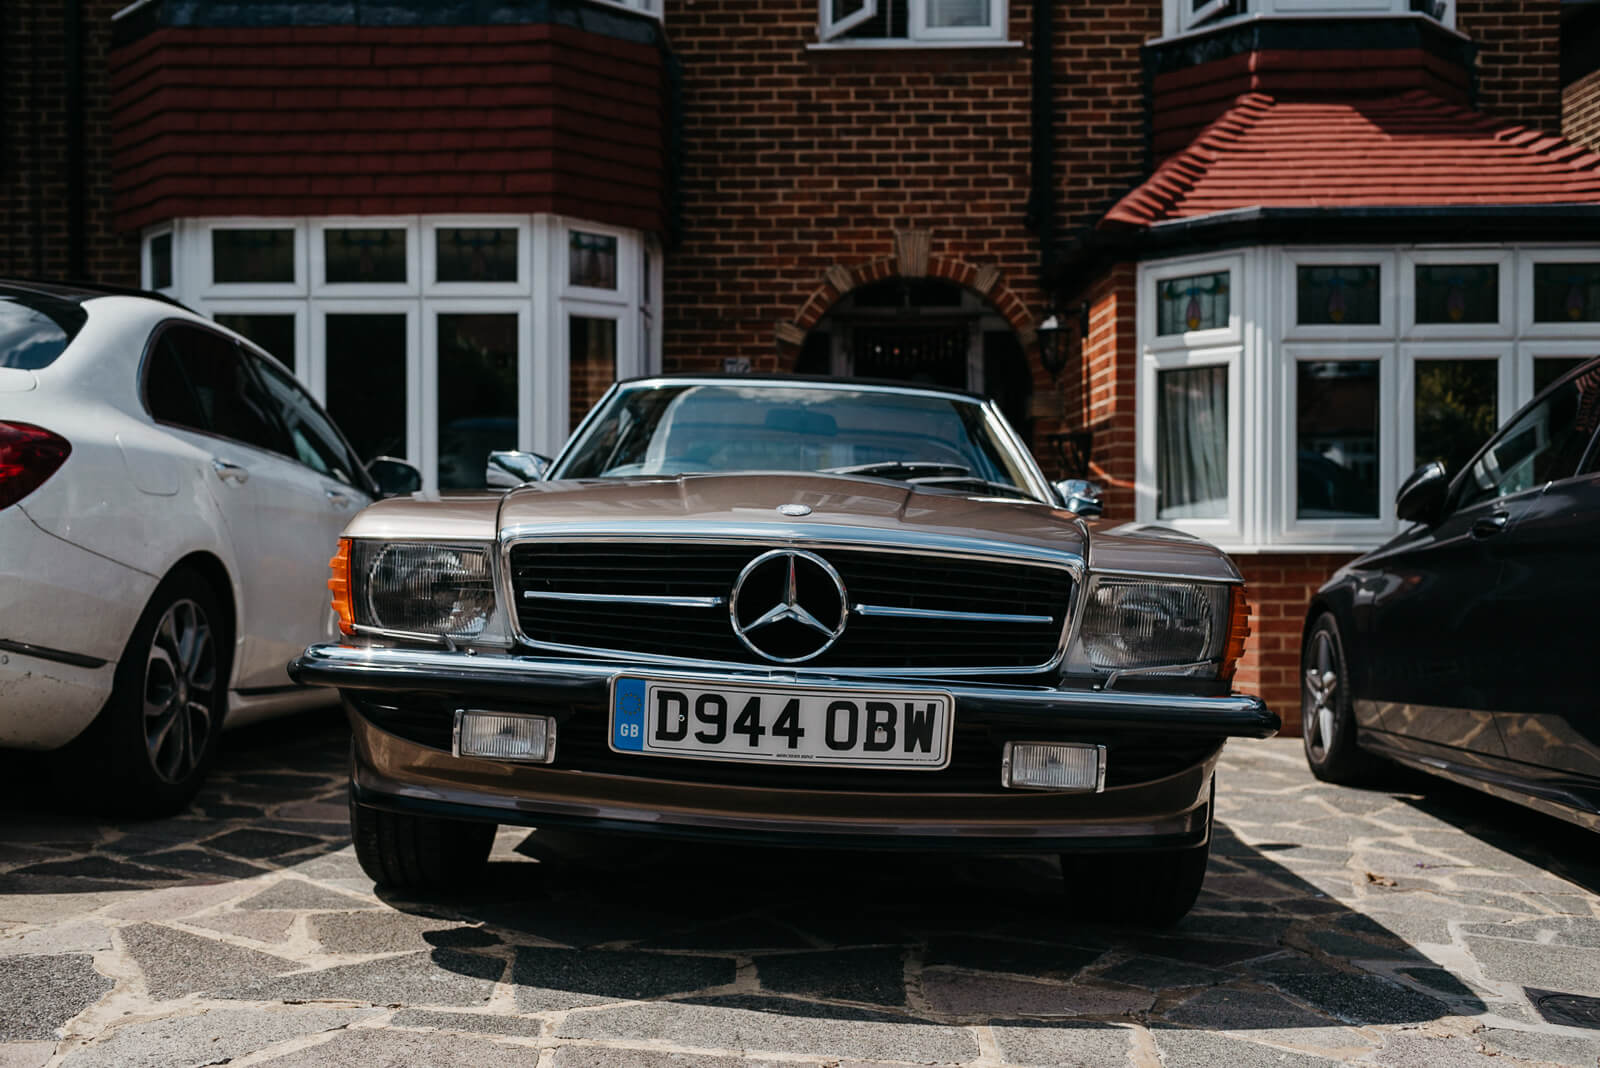 Vintage mercedes wedding car for London Wedding